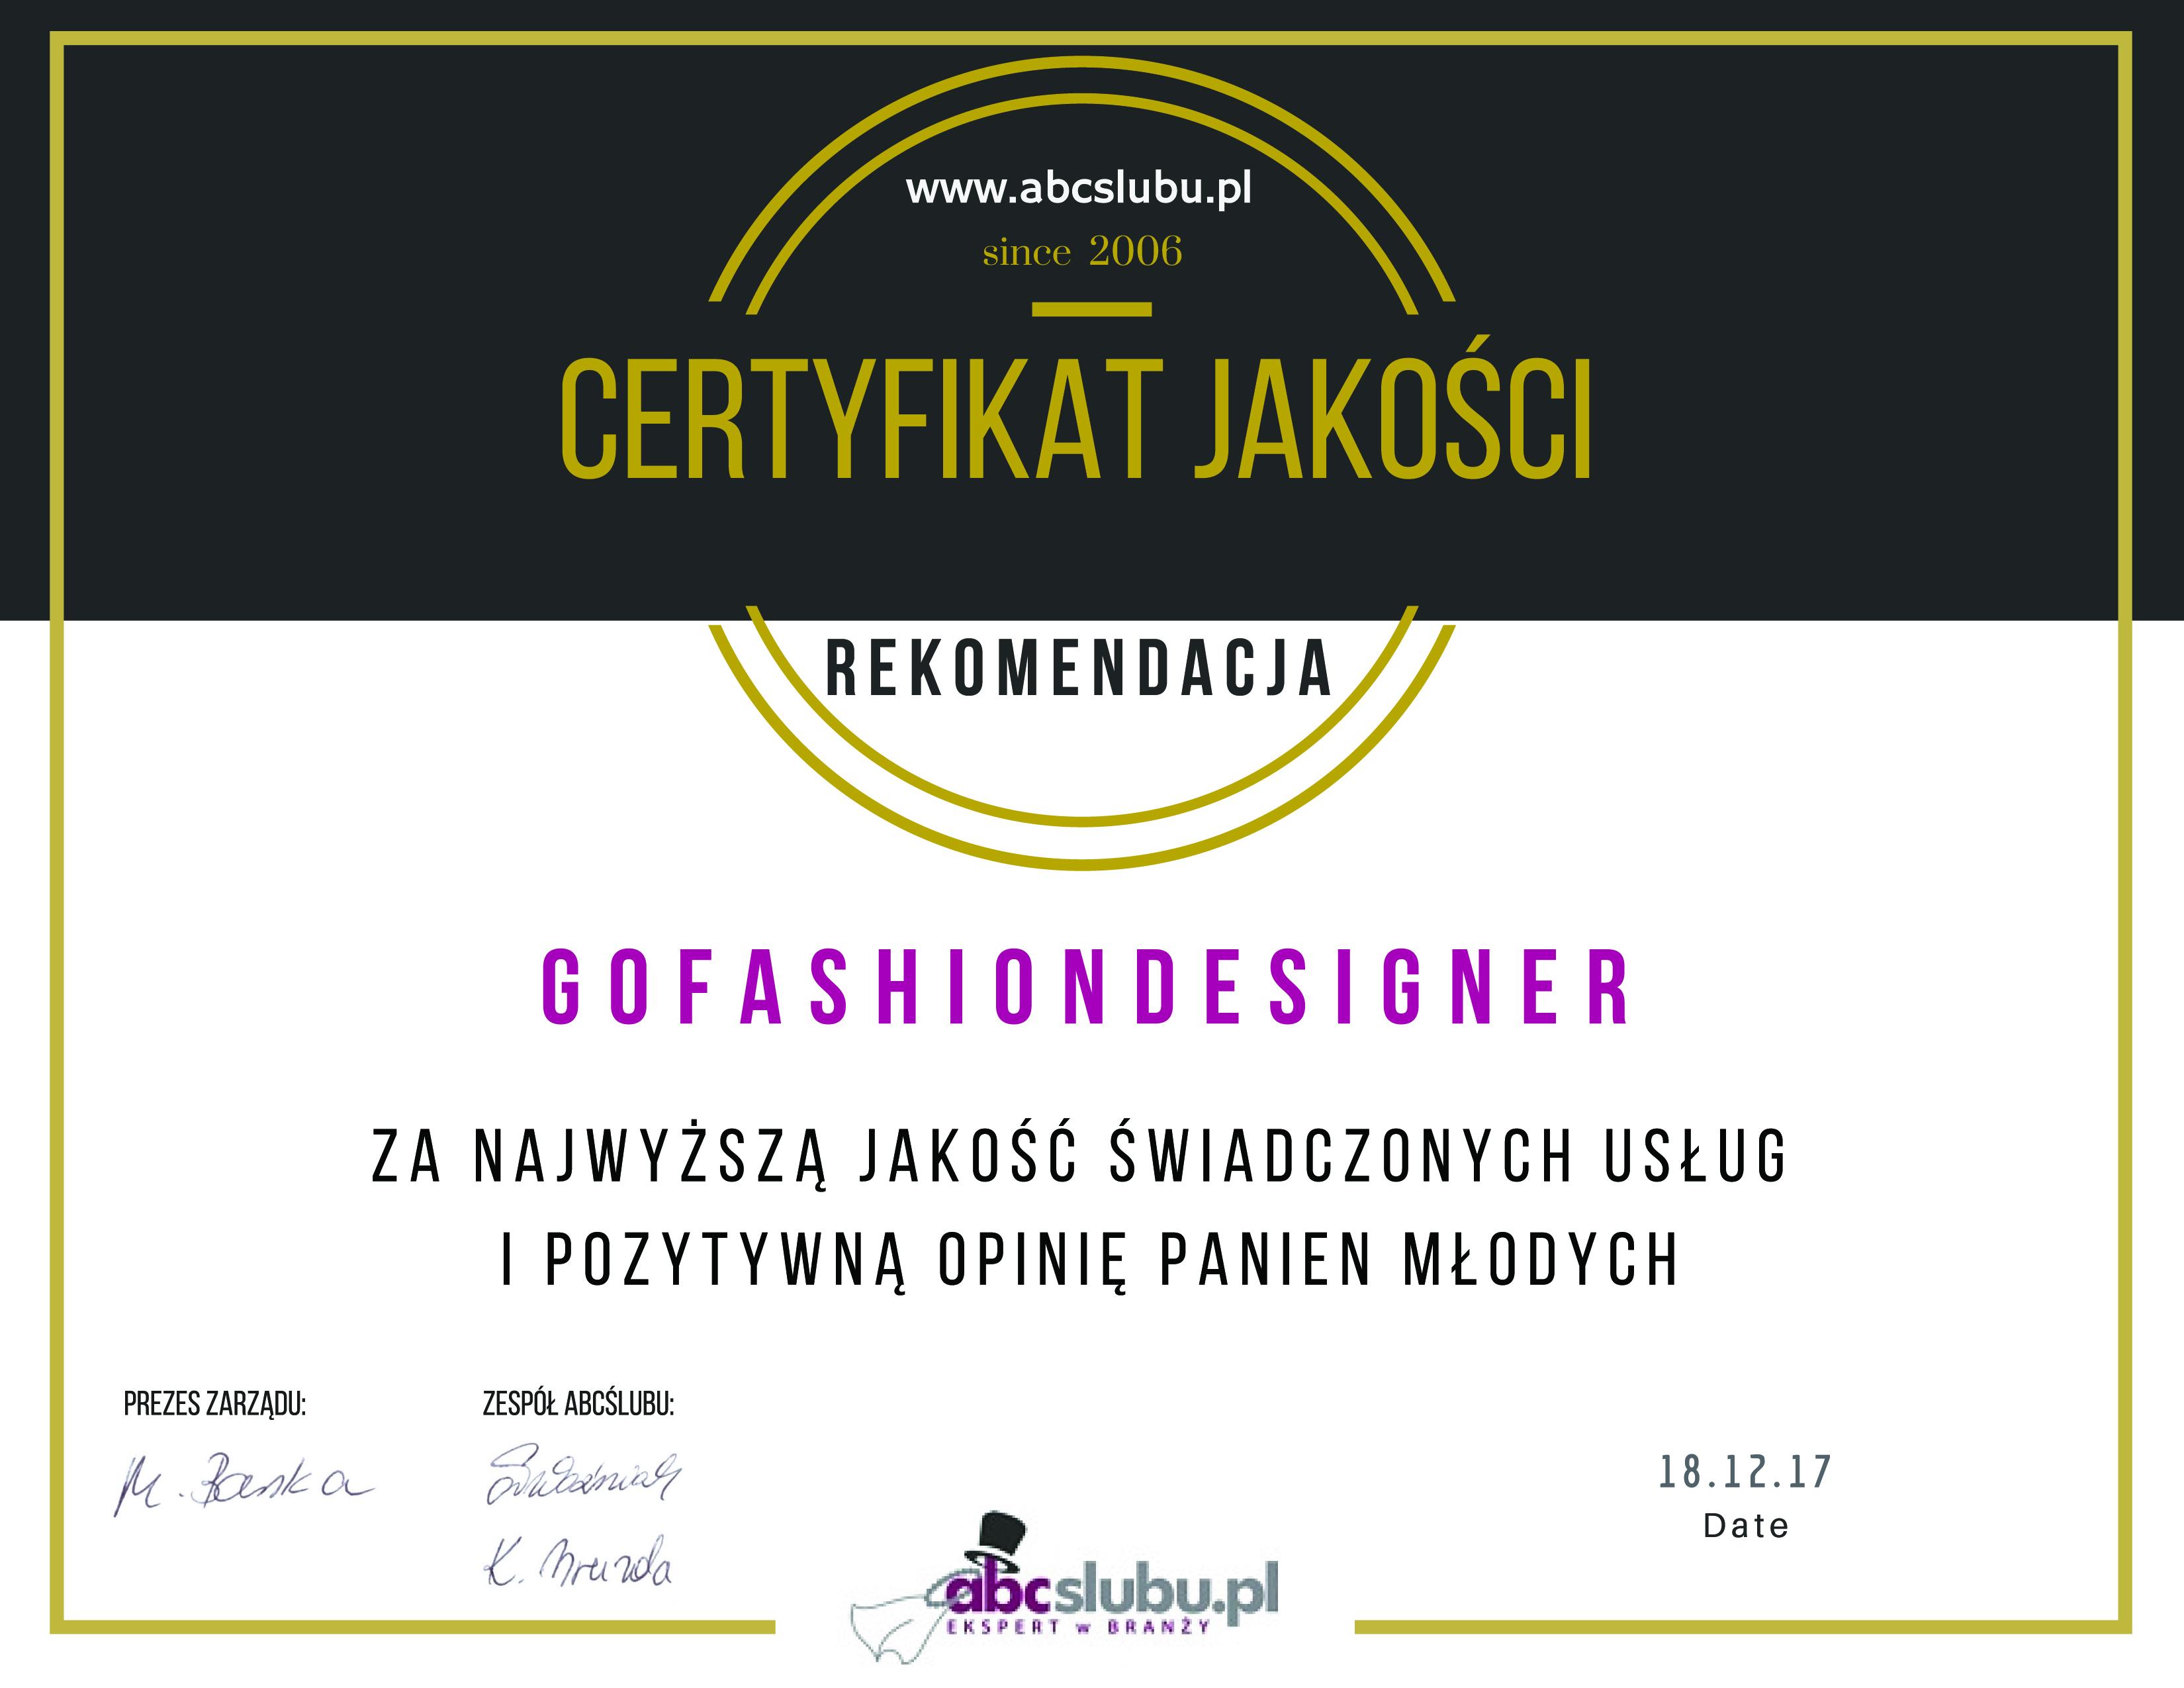 ceryfikat-jakosci-go-fashion-designer